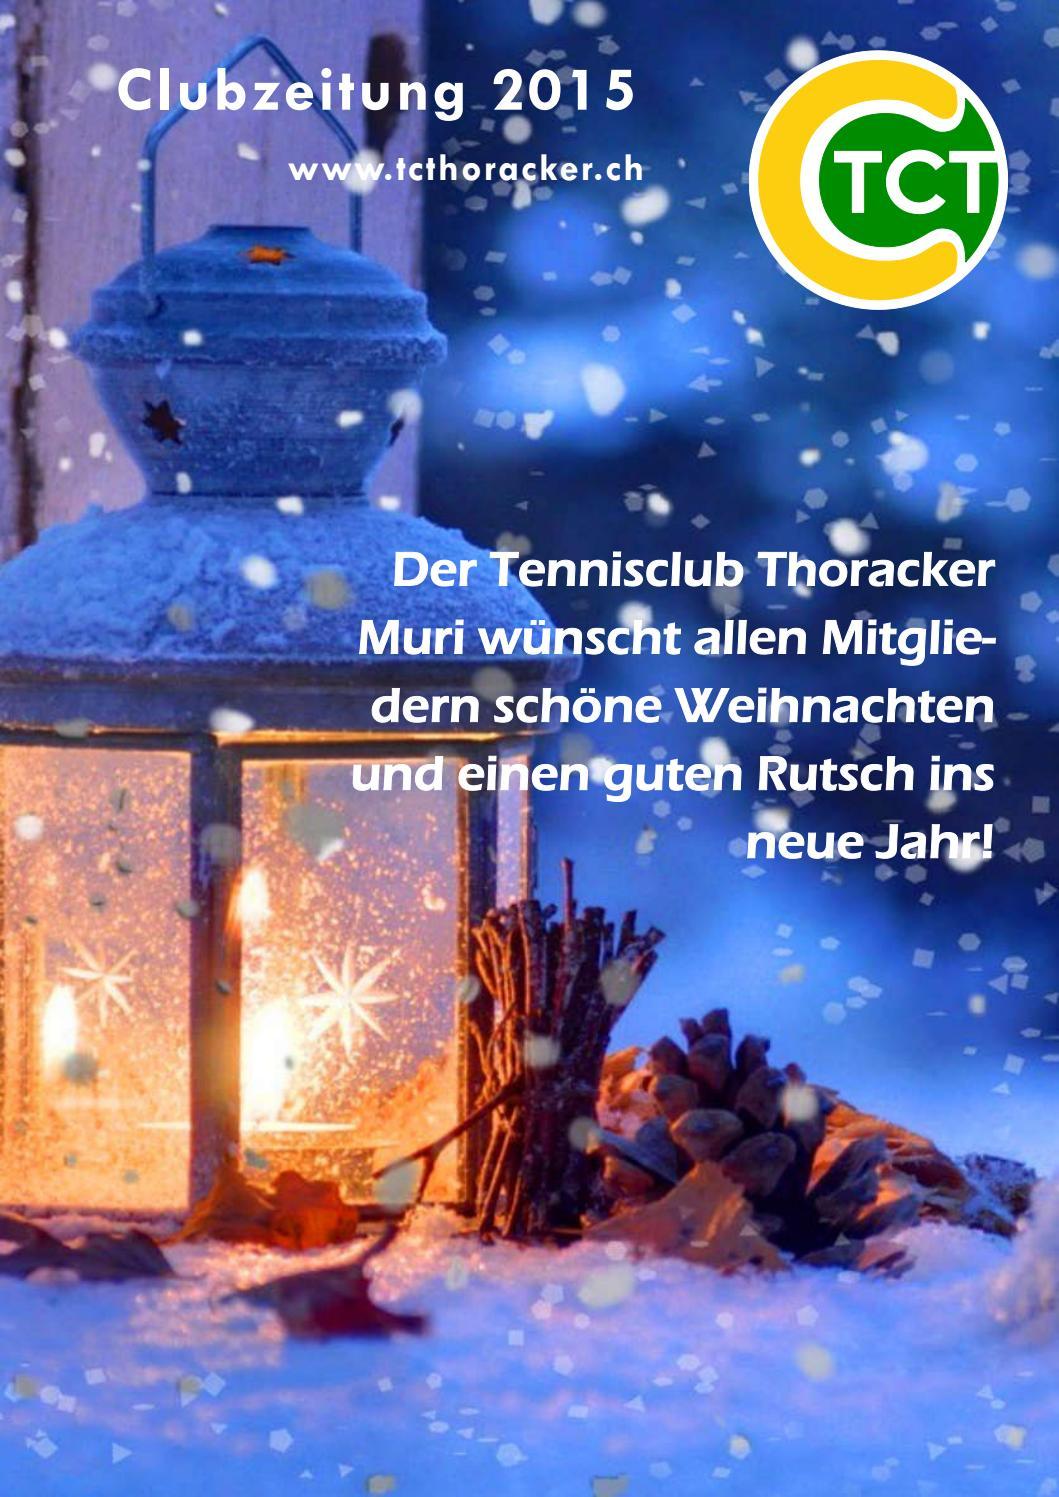 TCT-Clubzeitung Ausgabe 2015 by TCT - issuu